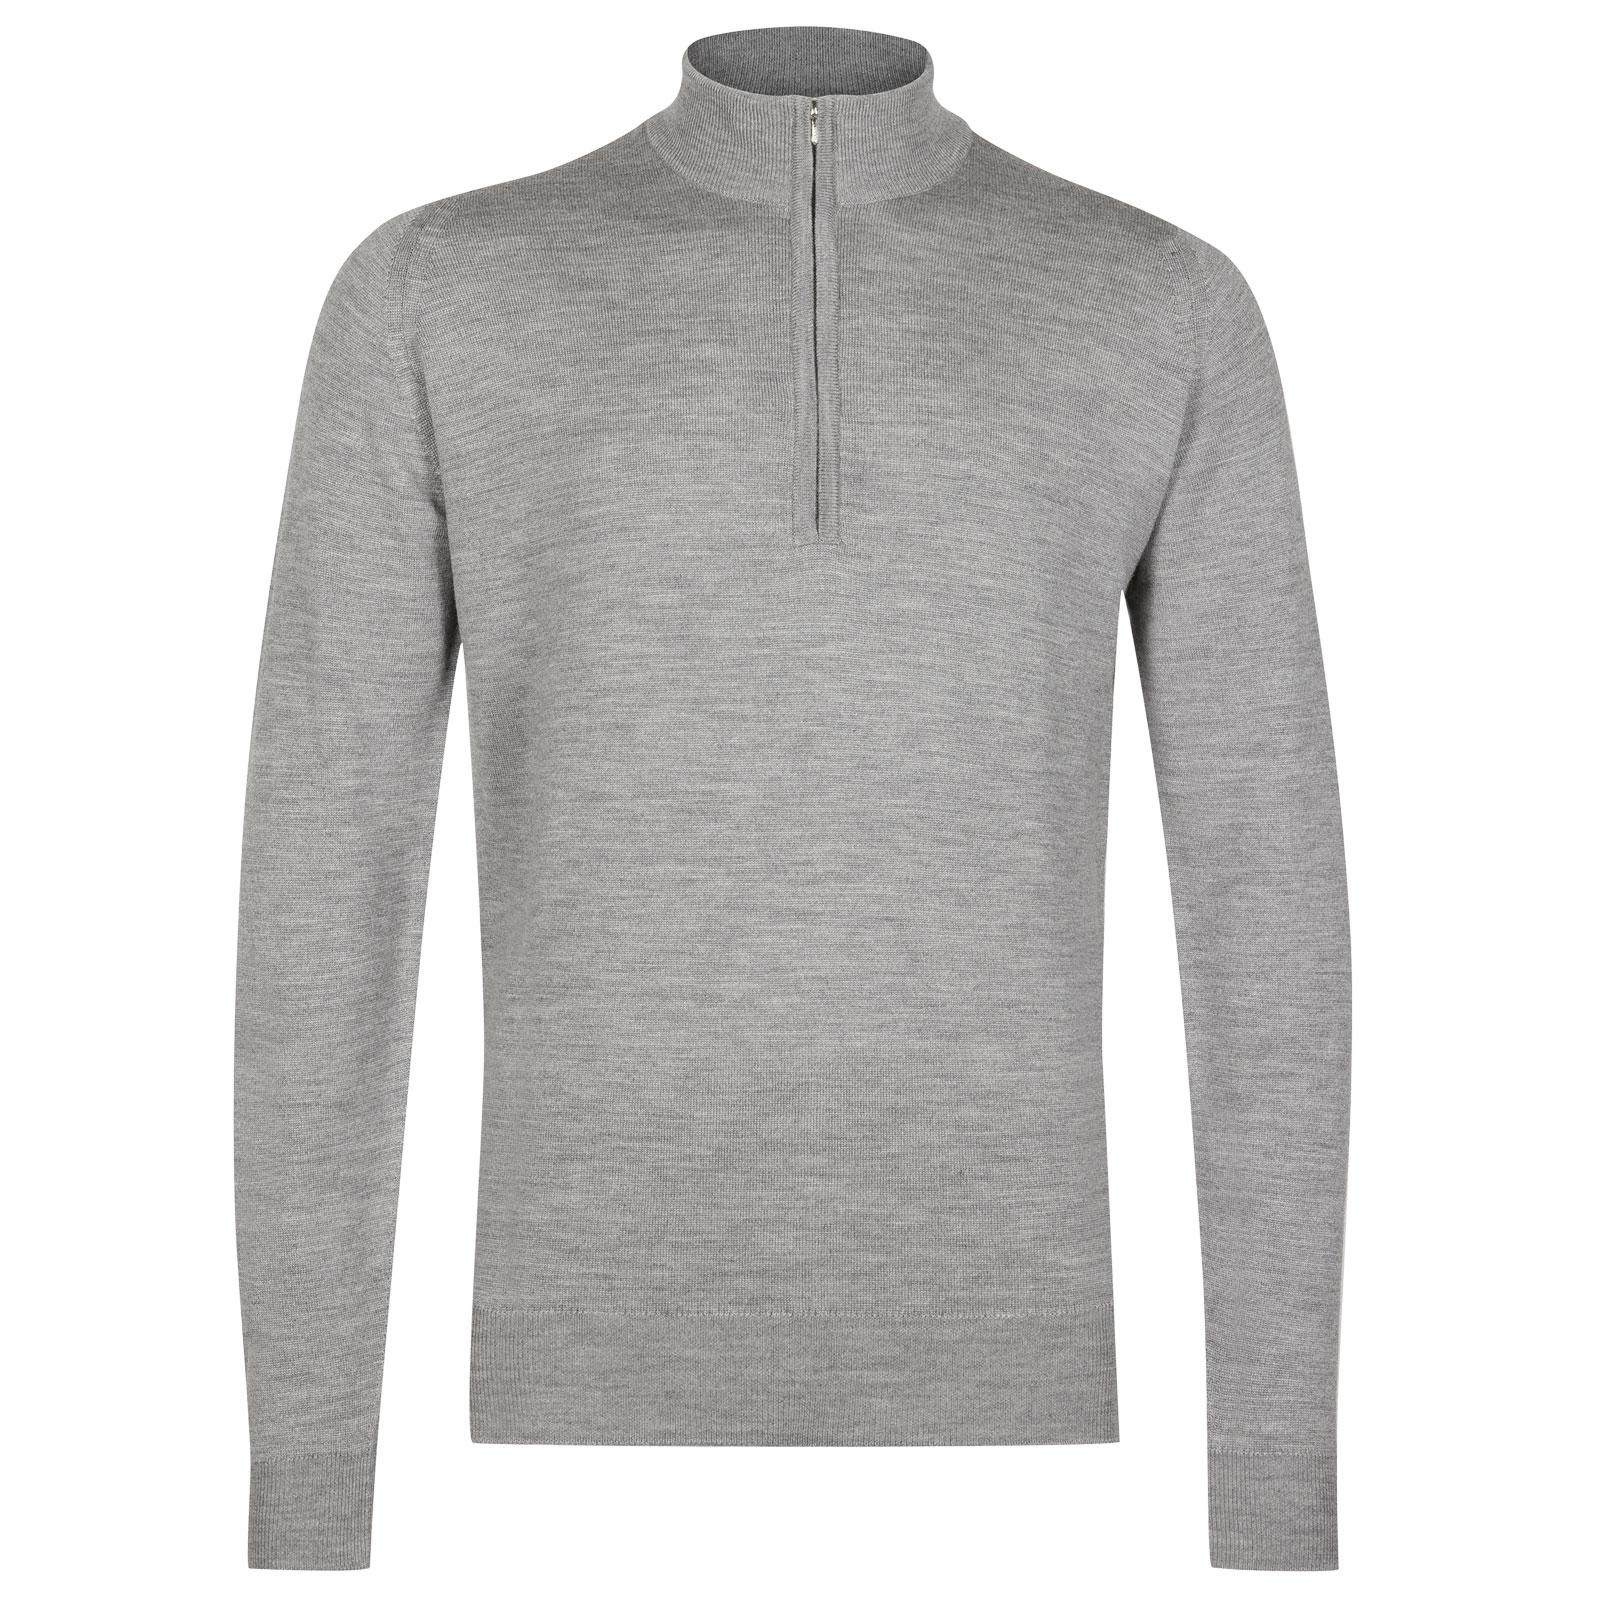 John Smedley tapton Merino Wool Pullover in Silver-XXL